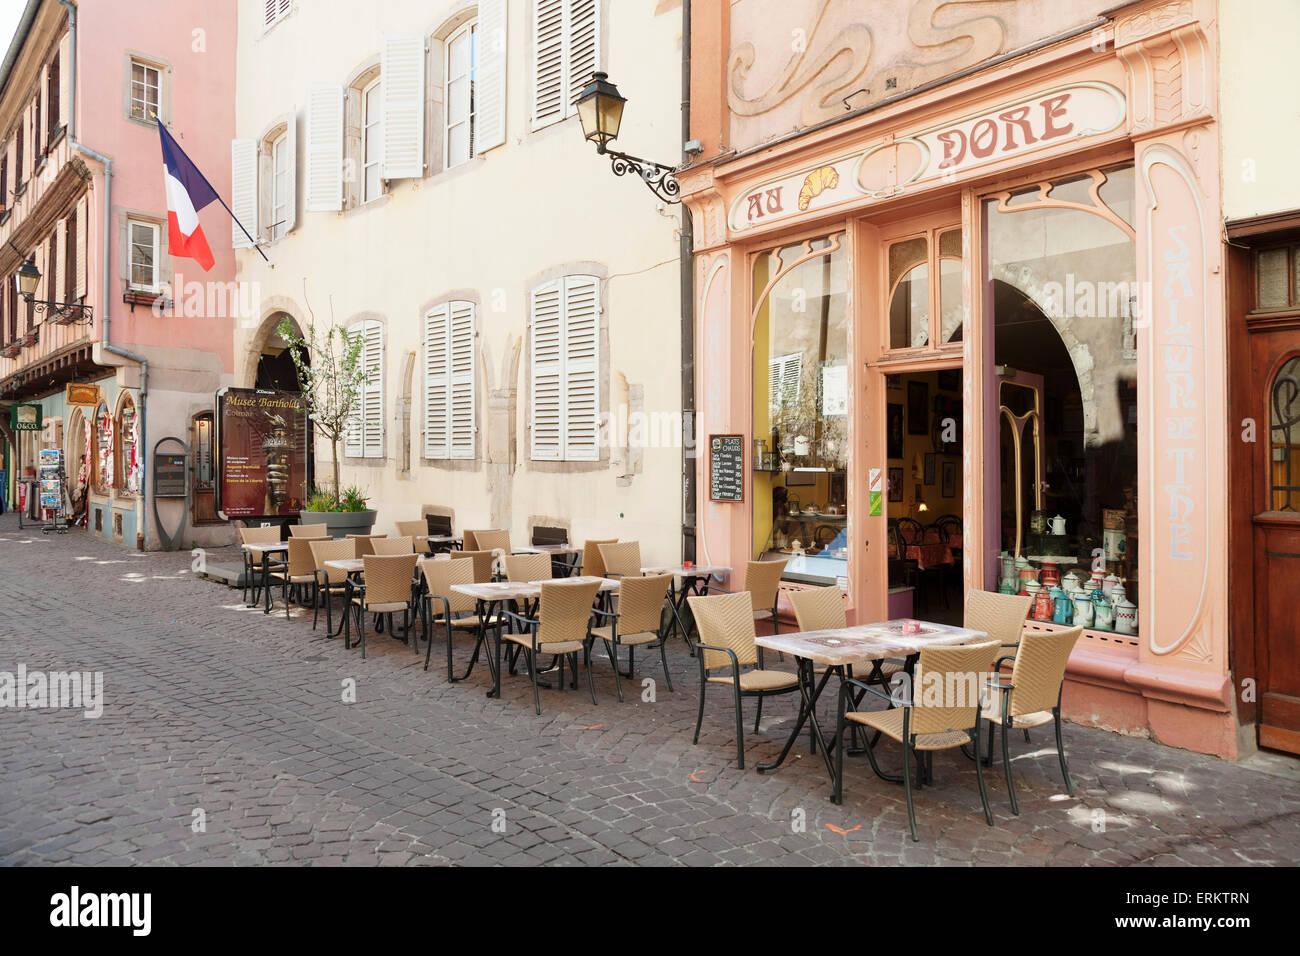 Cafe Au Croissant Dore, Rue Marchands, Colmar, Alsace, France, Europe - Stock Image